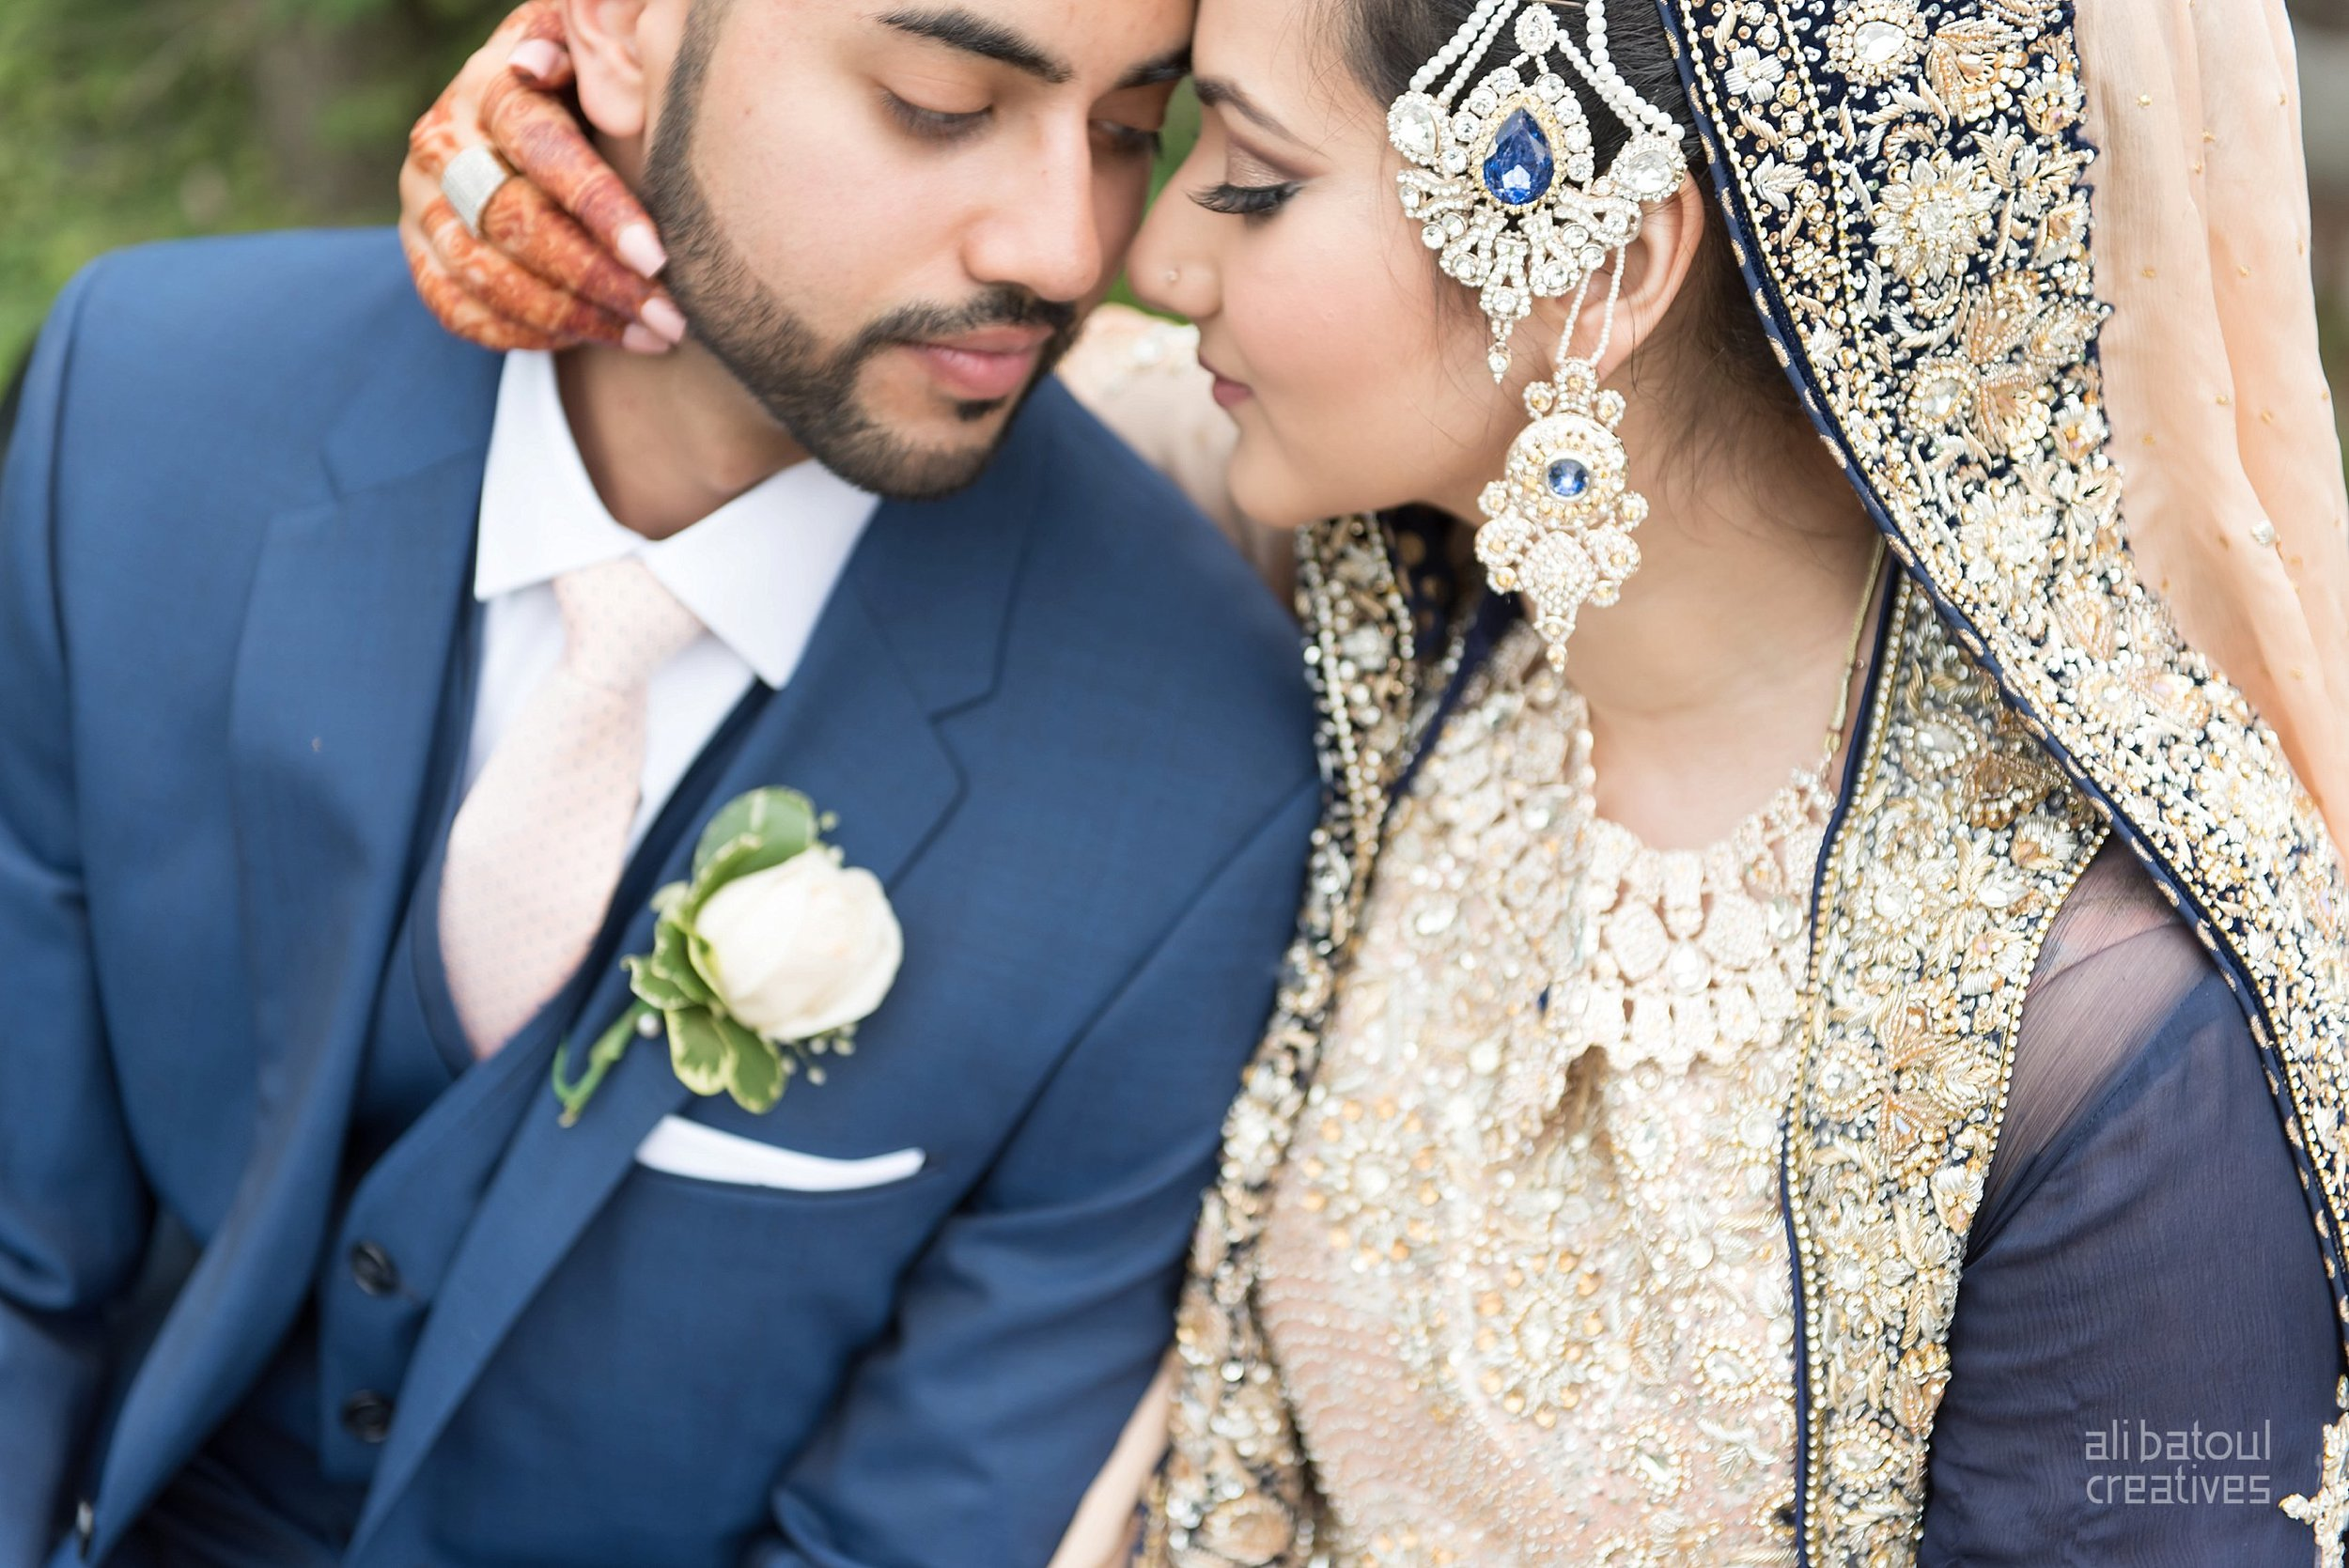 Alina + Mahmood - Ali Batoul Creatives Blog-52_Stomped.jpg